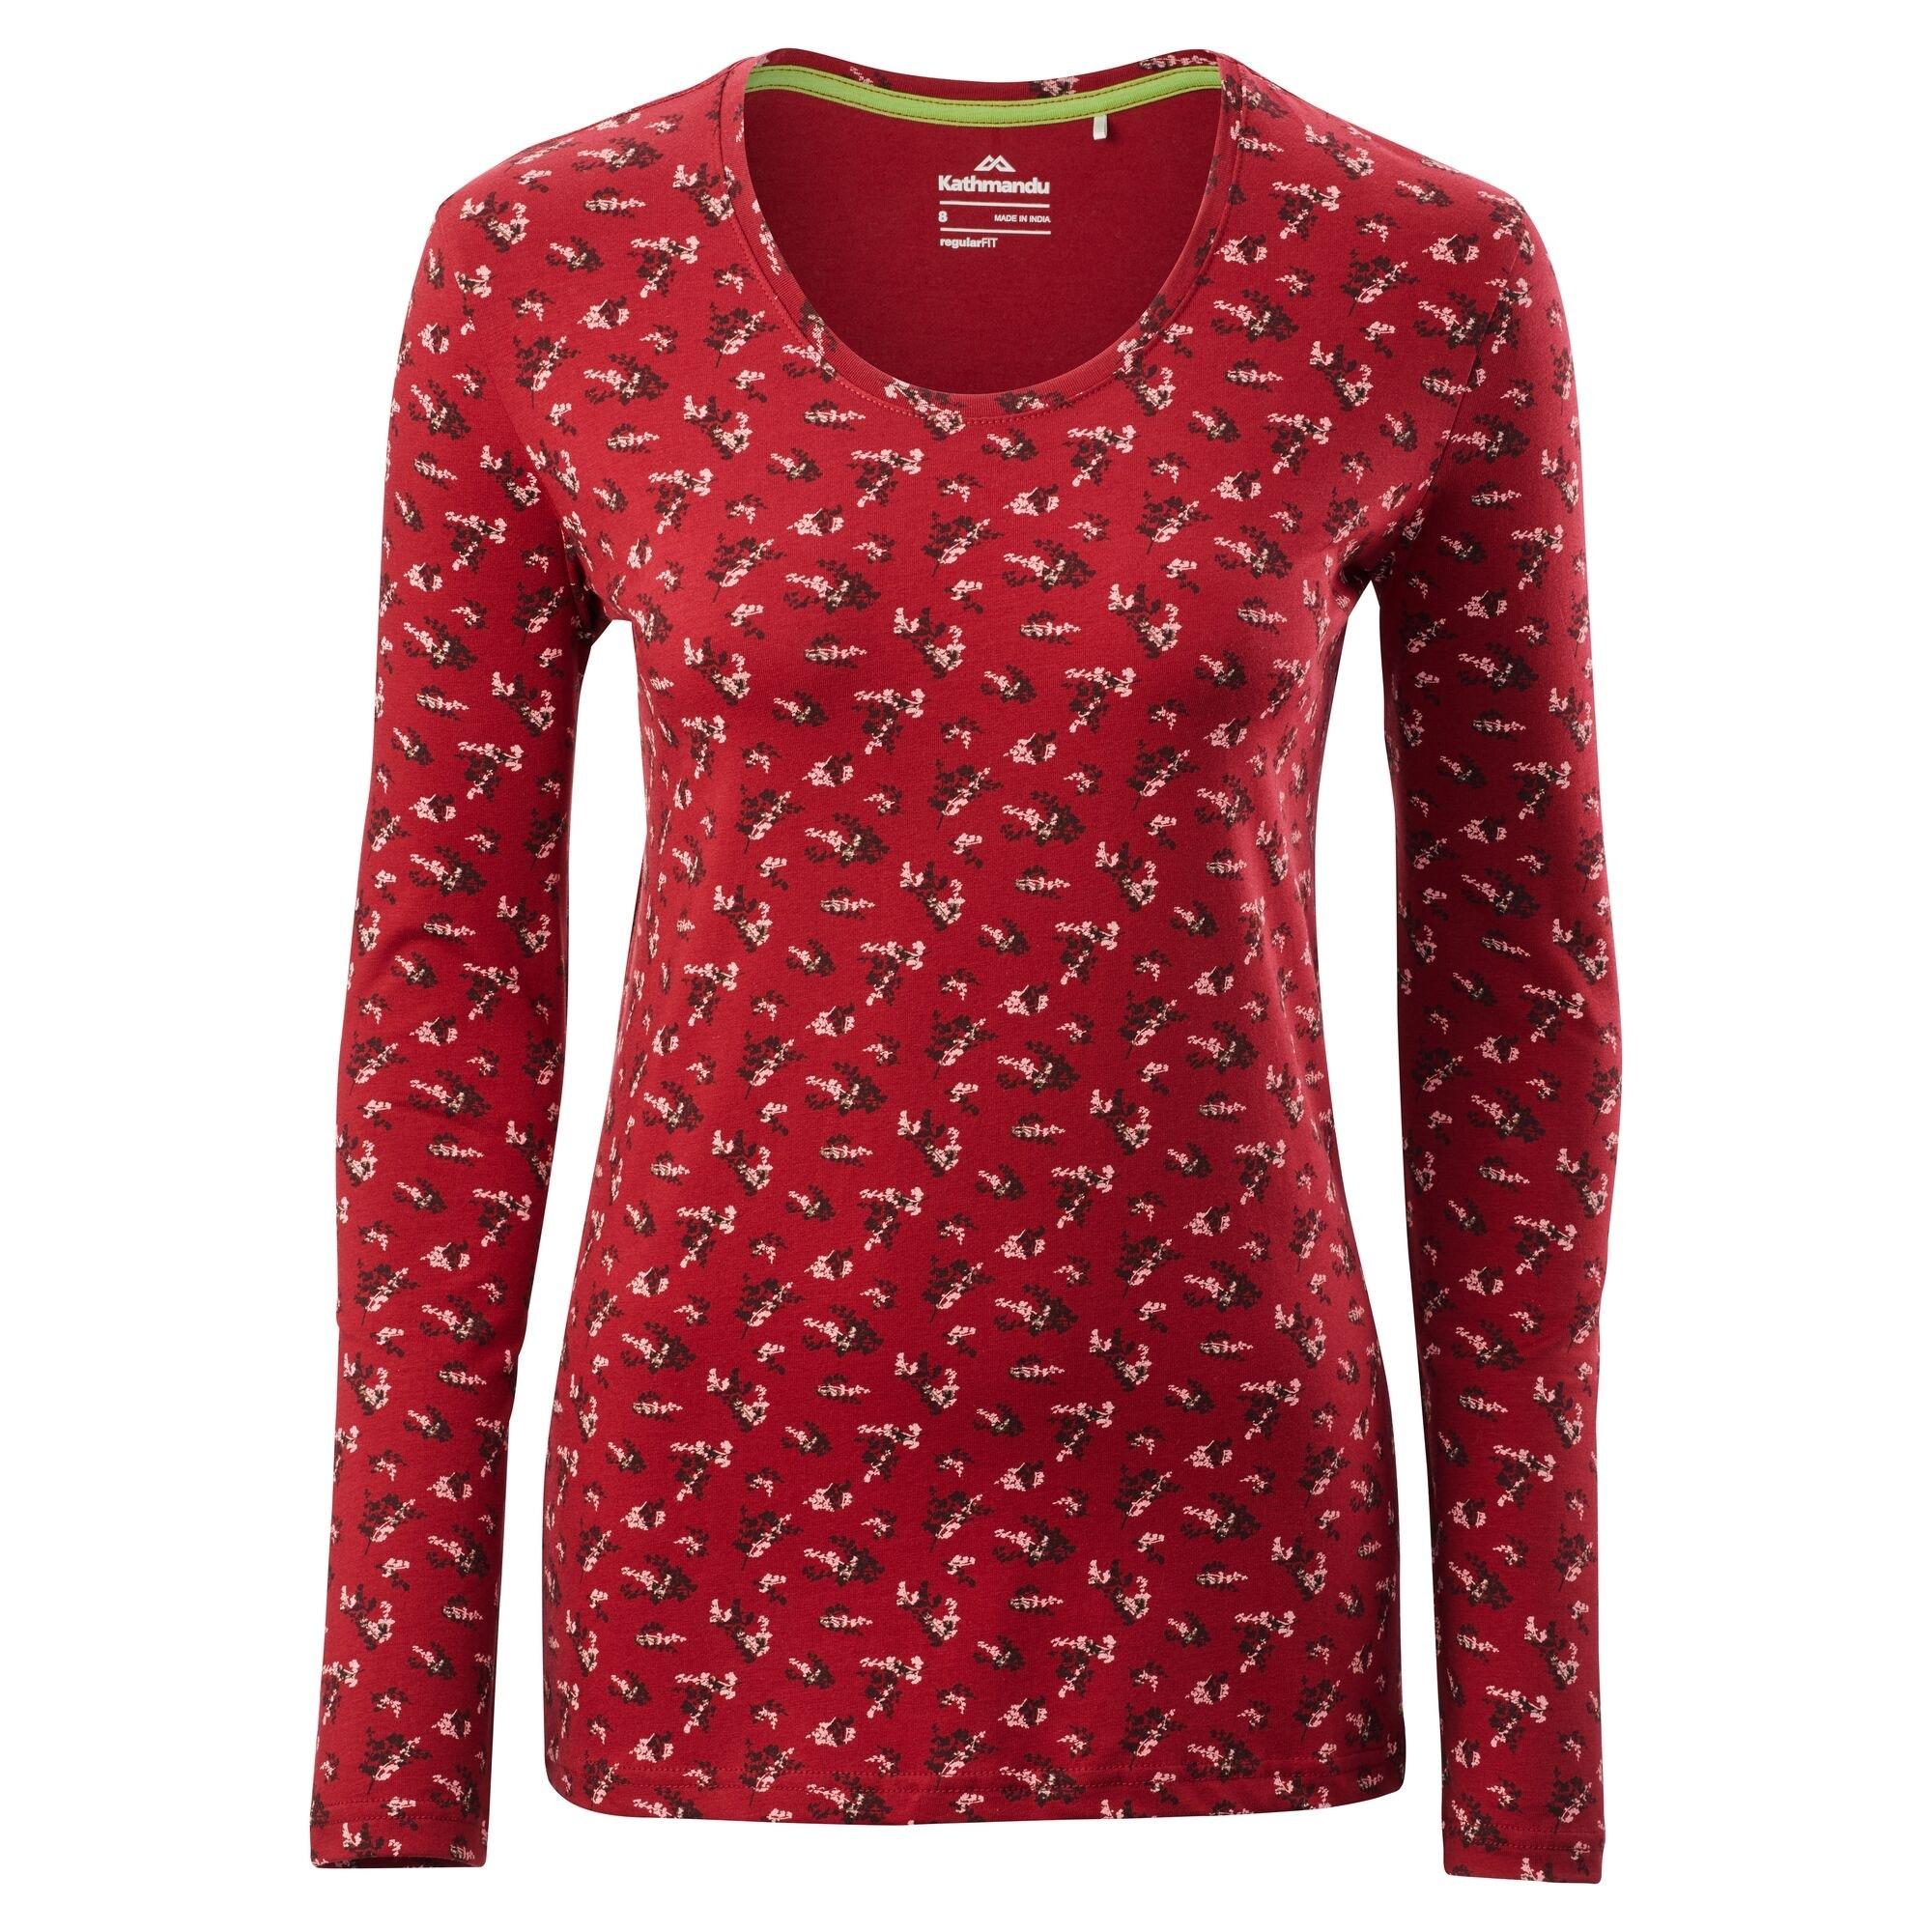 69782cce51294 Mini Spring Blossom Women's Long Sleeve T-Shirt